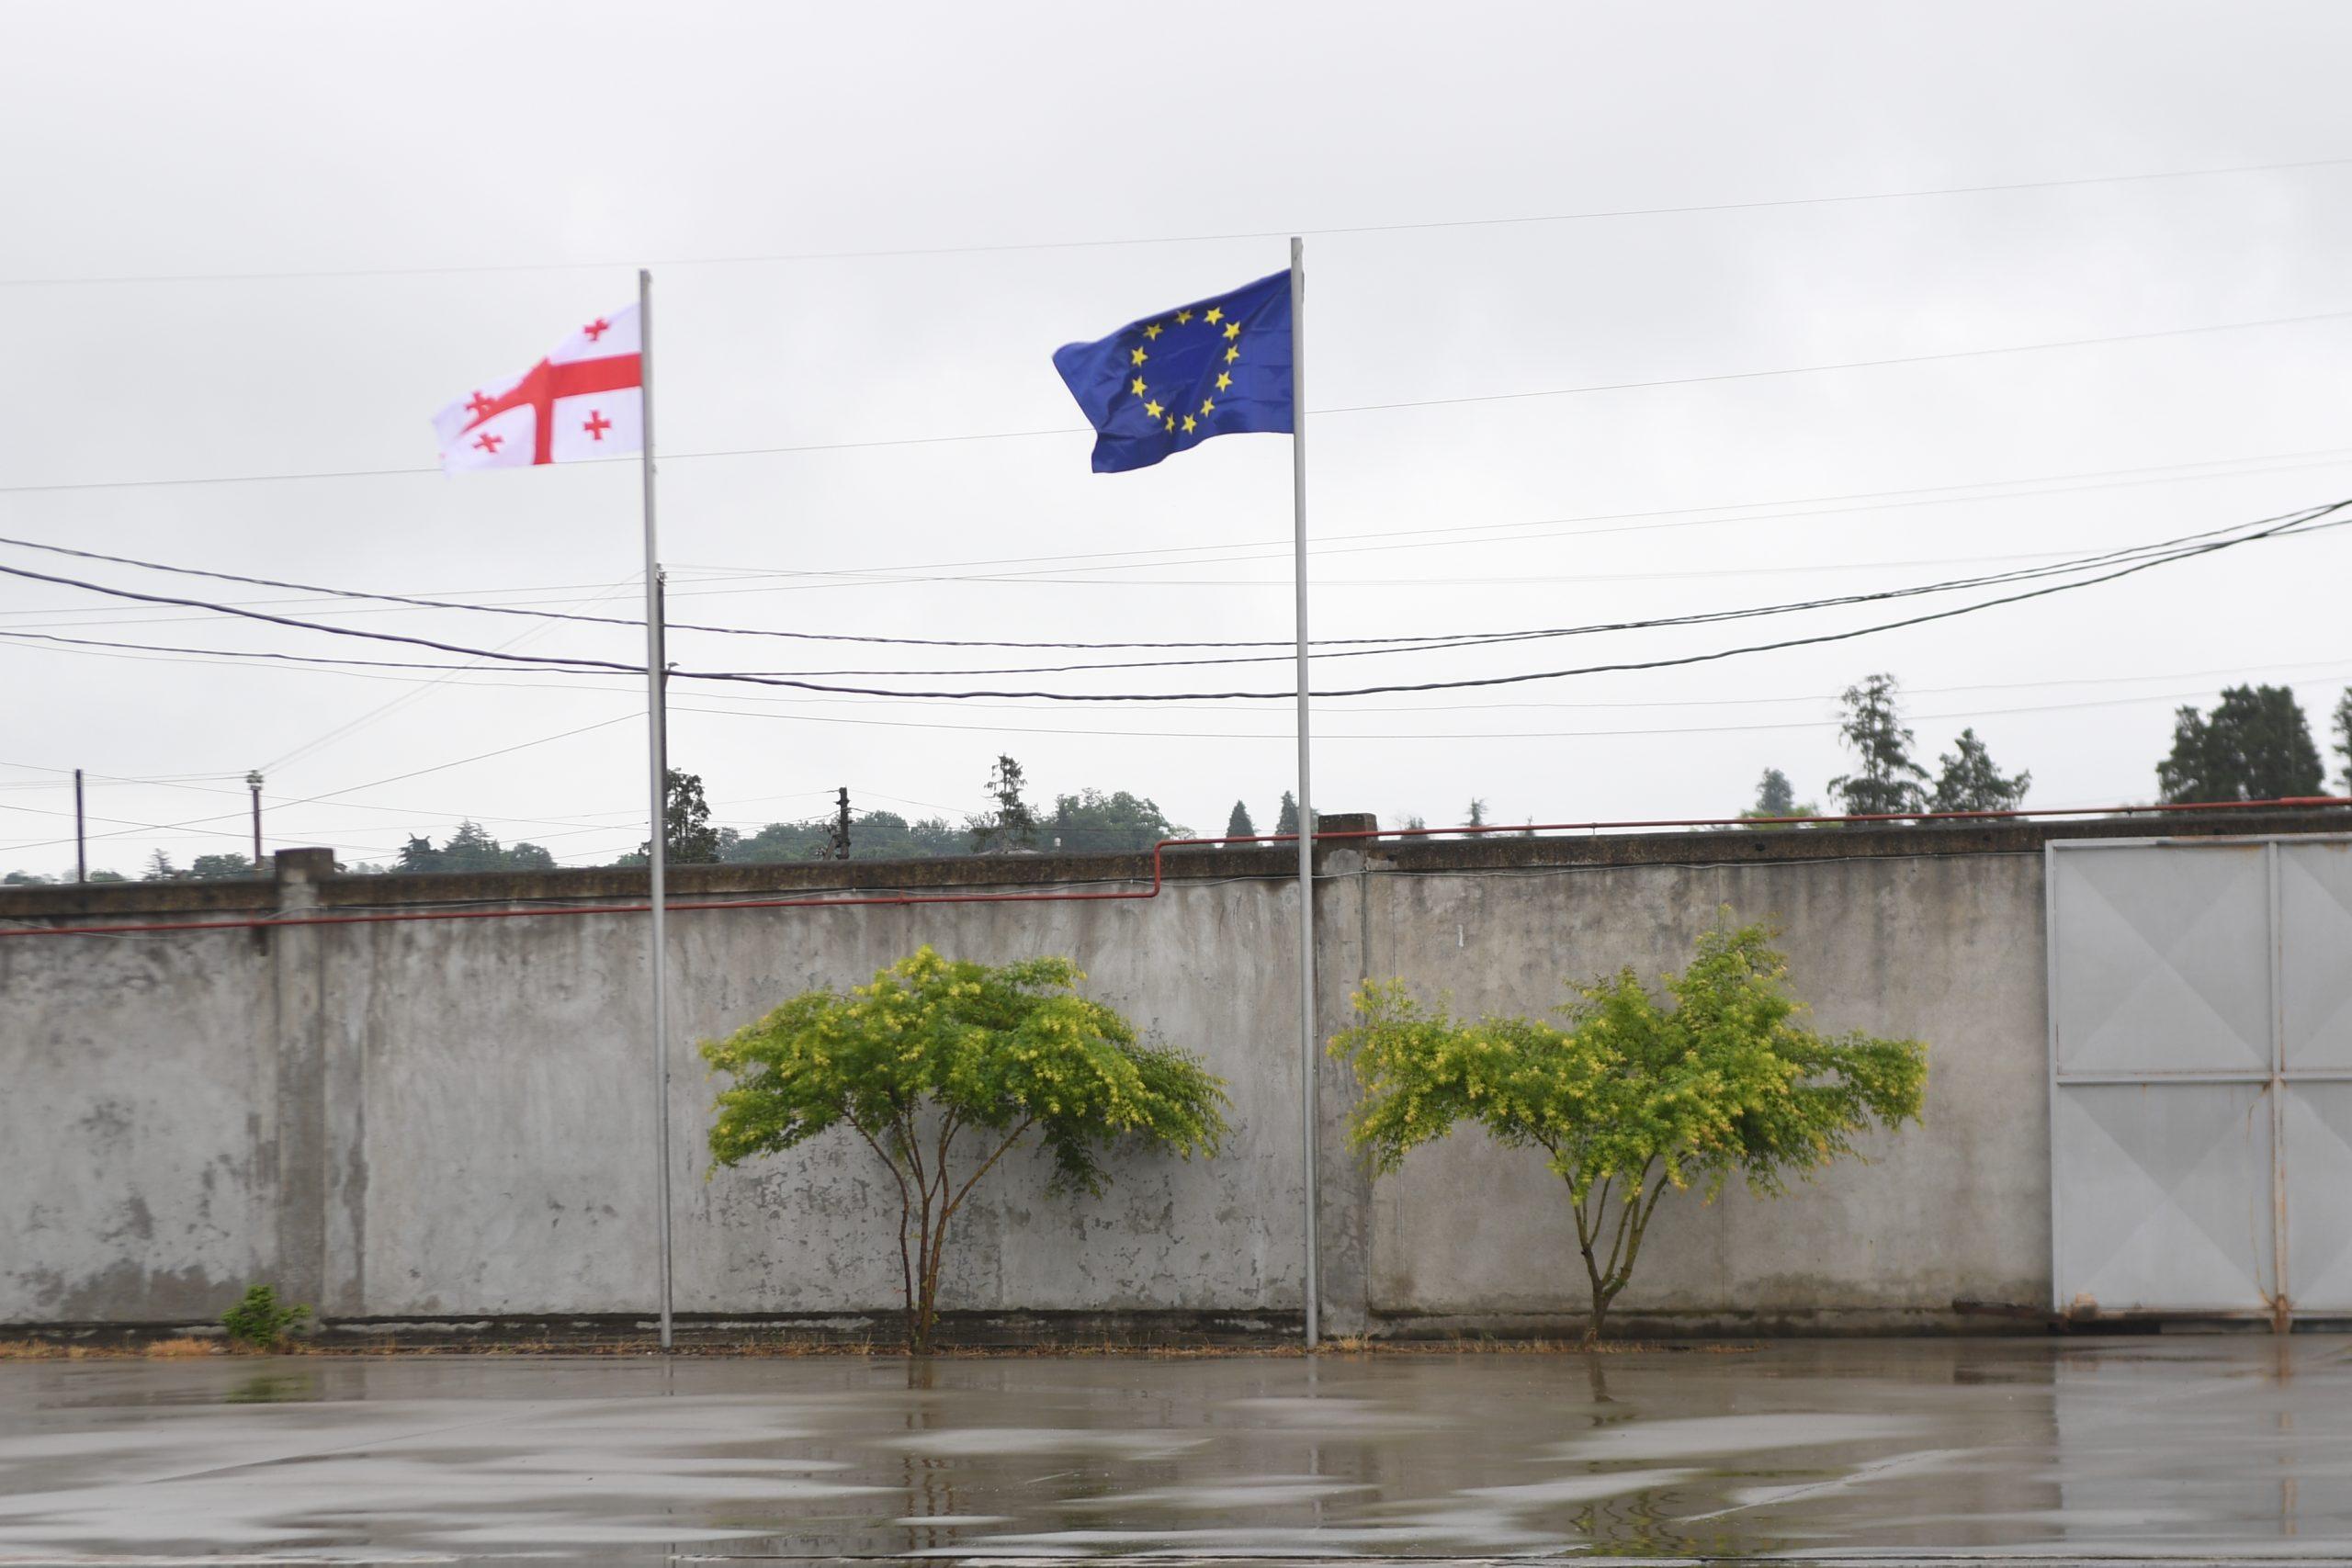 JUD 3901 scaled 1 #общество EIB Group, InnovFin, Грузия-ЕС, евросоюз, спонсорский контент, фундук